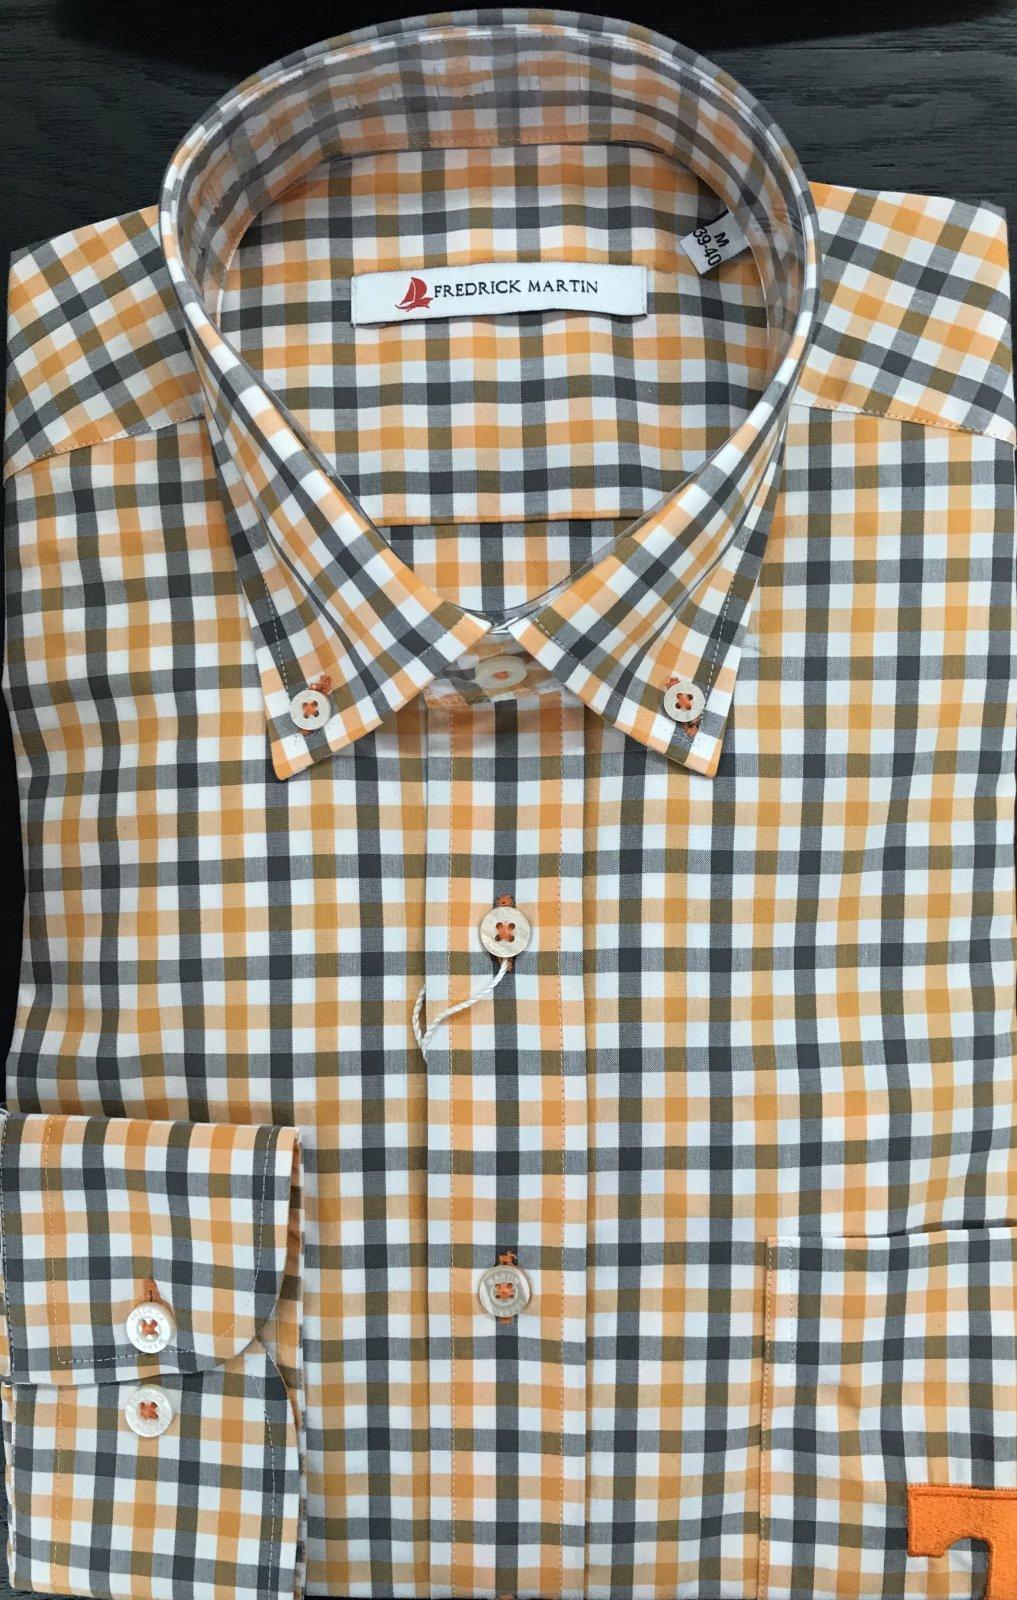 Frederick Martin Collegiate LS Shirt 26